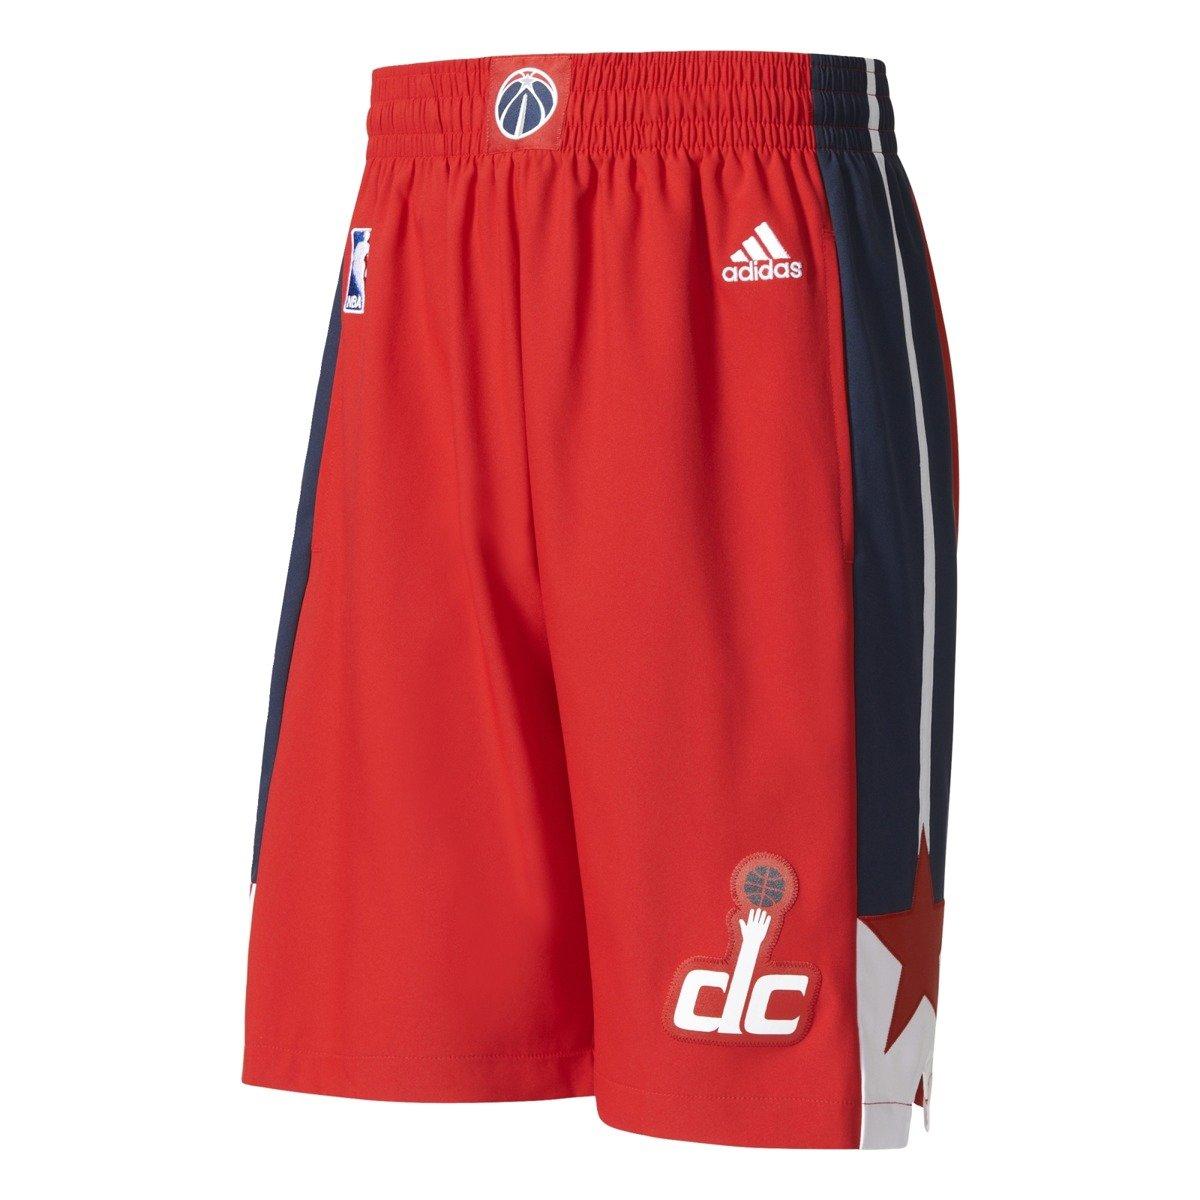 Adidas Washington Wizards NBA Swingman Basketball Shorts - A40867 ... 66d16ad3f08a